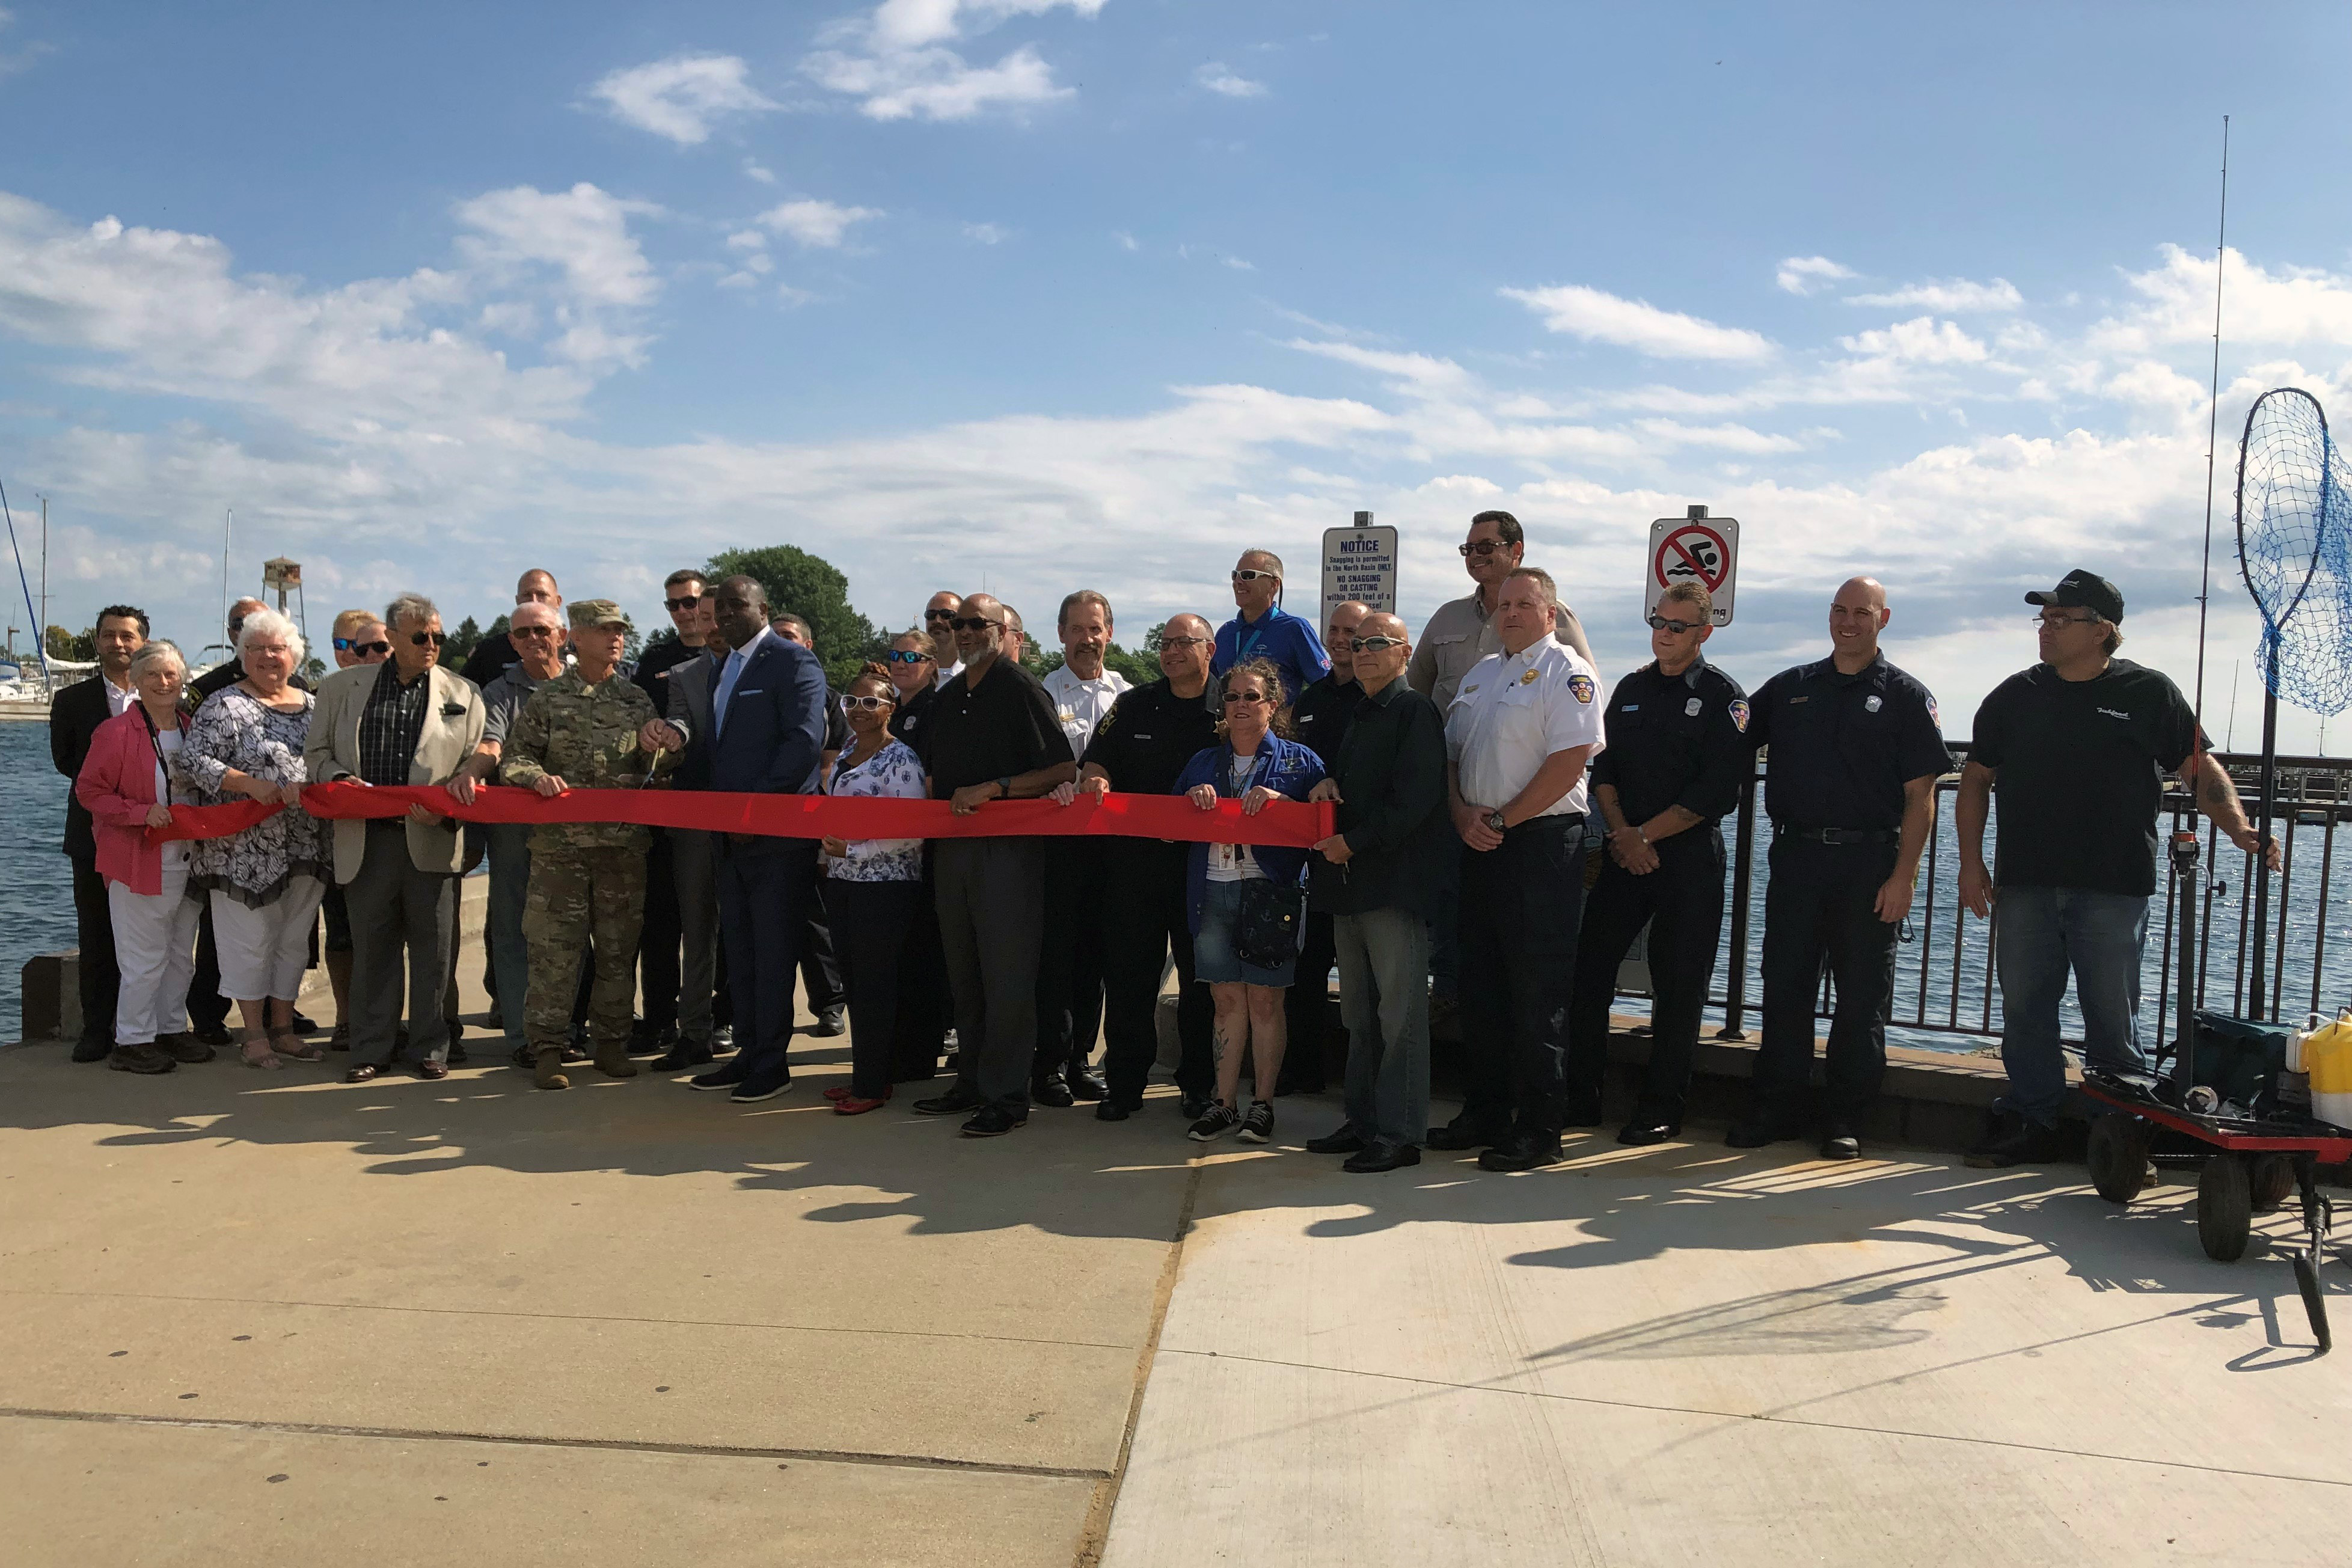 Popular pier in Waukegan, Illinois, back open for public